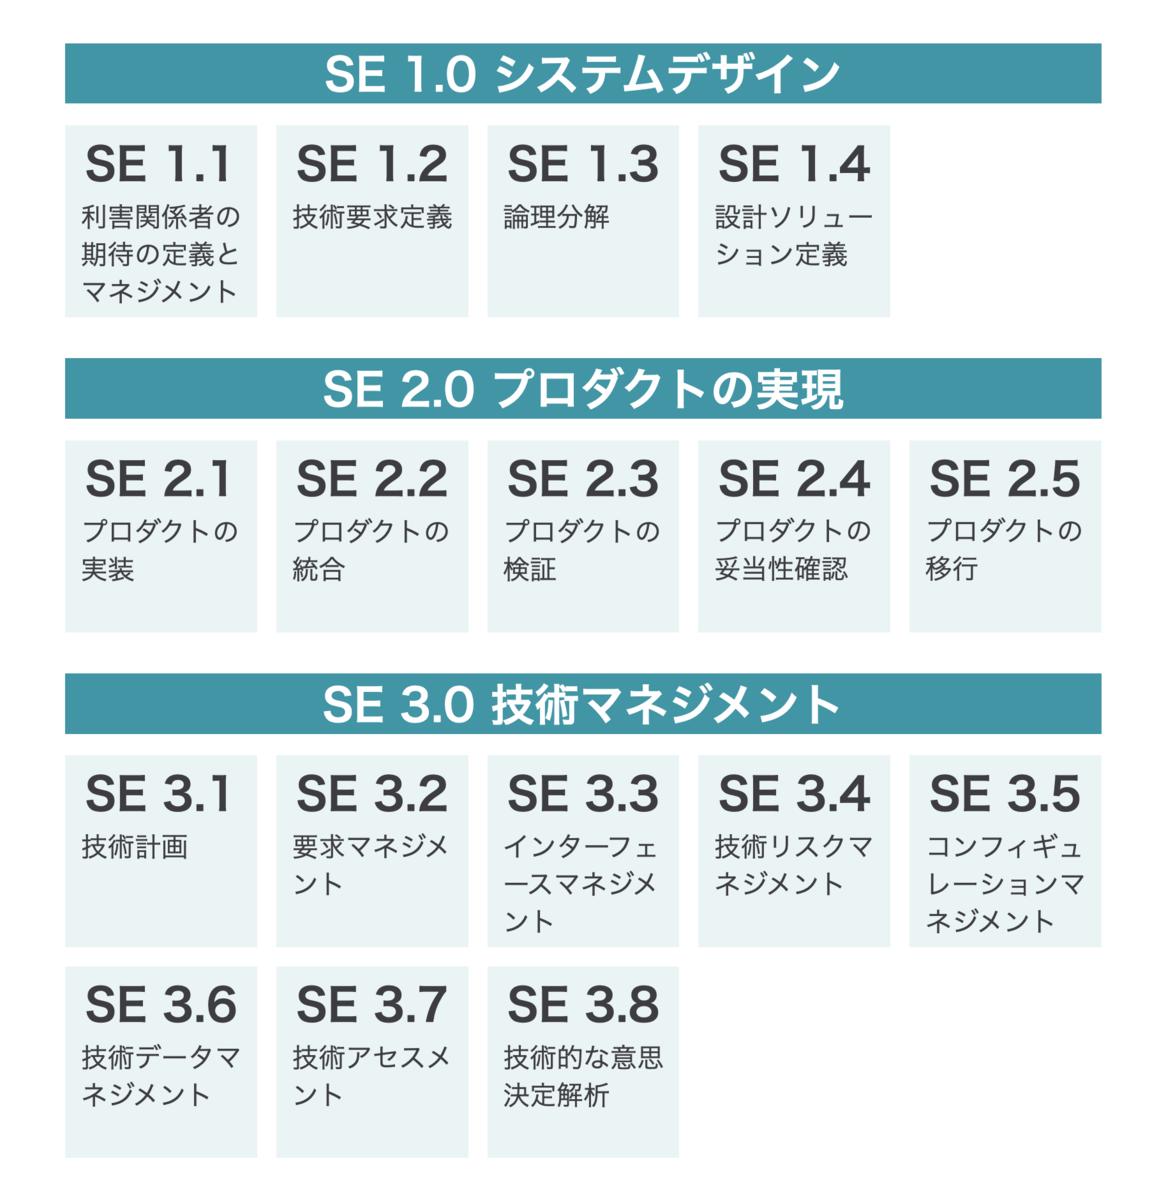 f:id:yonambu:20200523154746p:plain